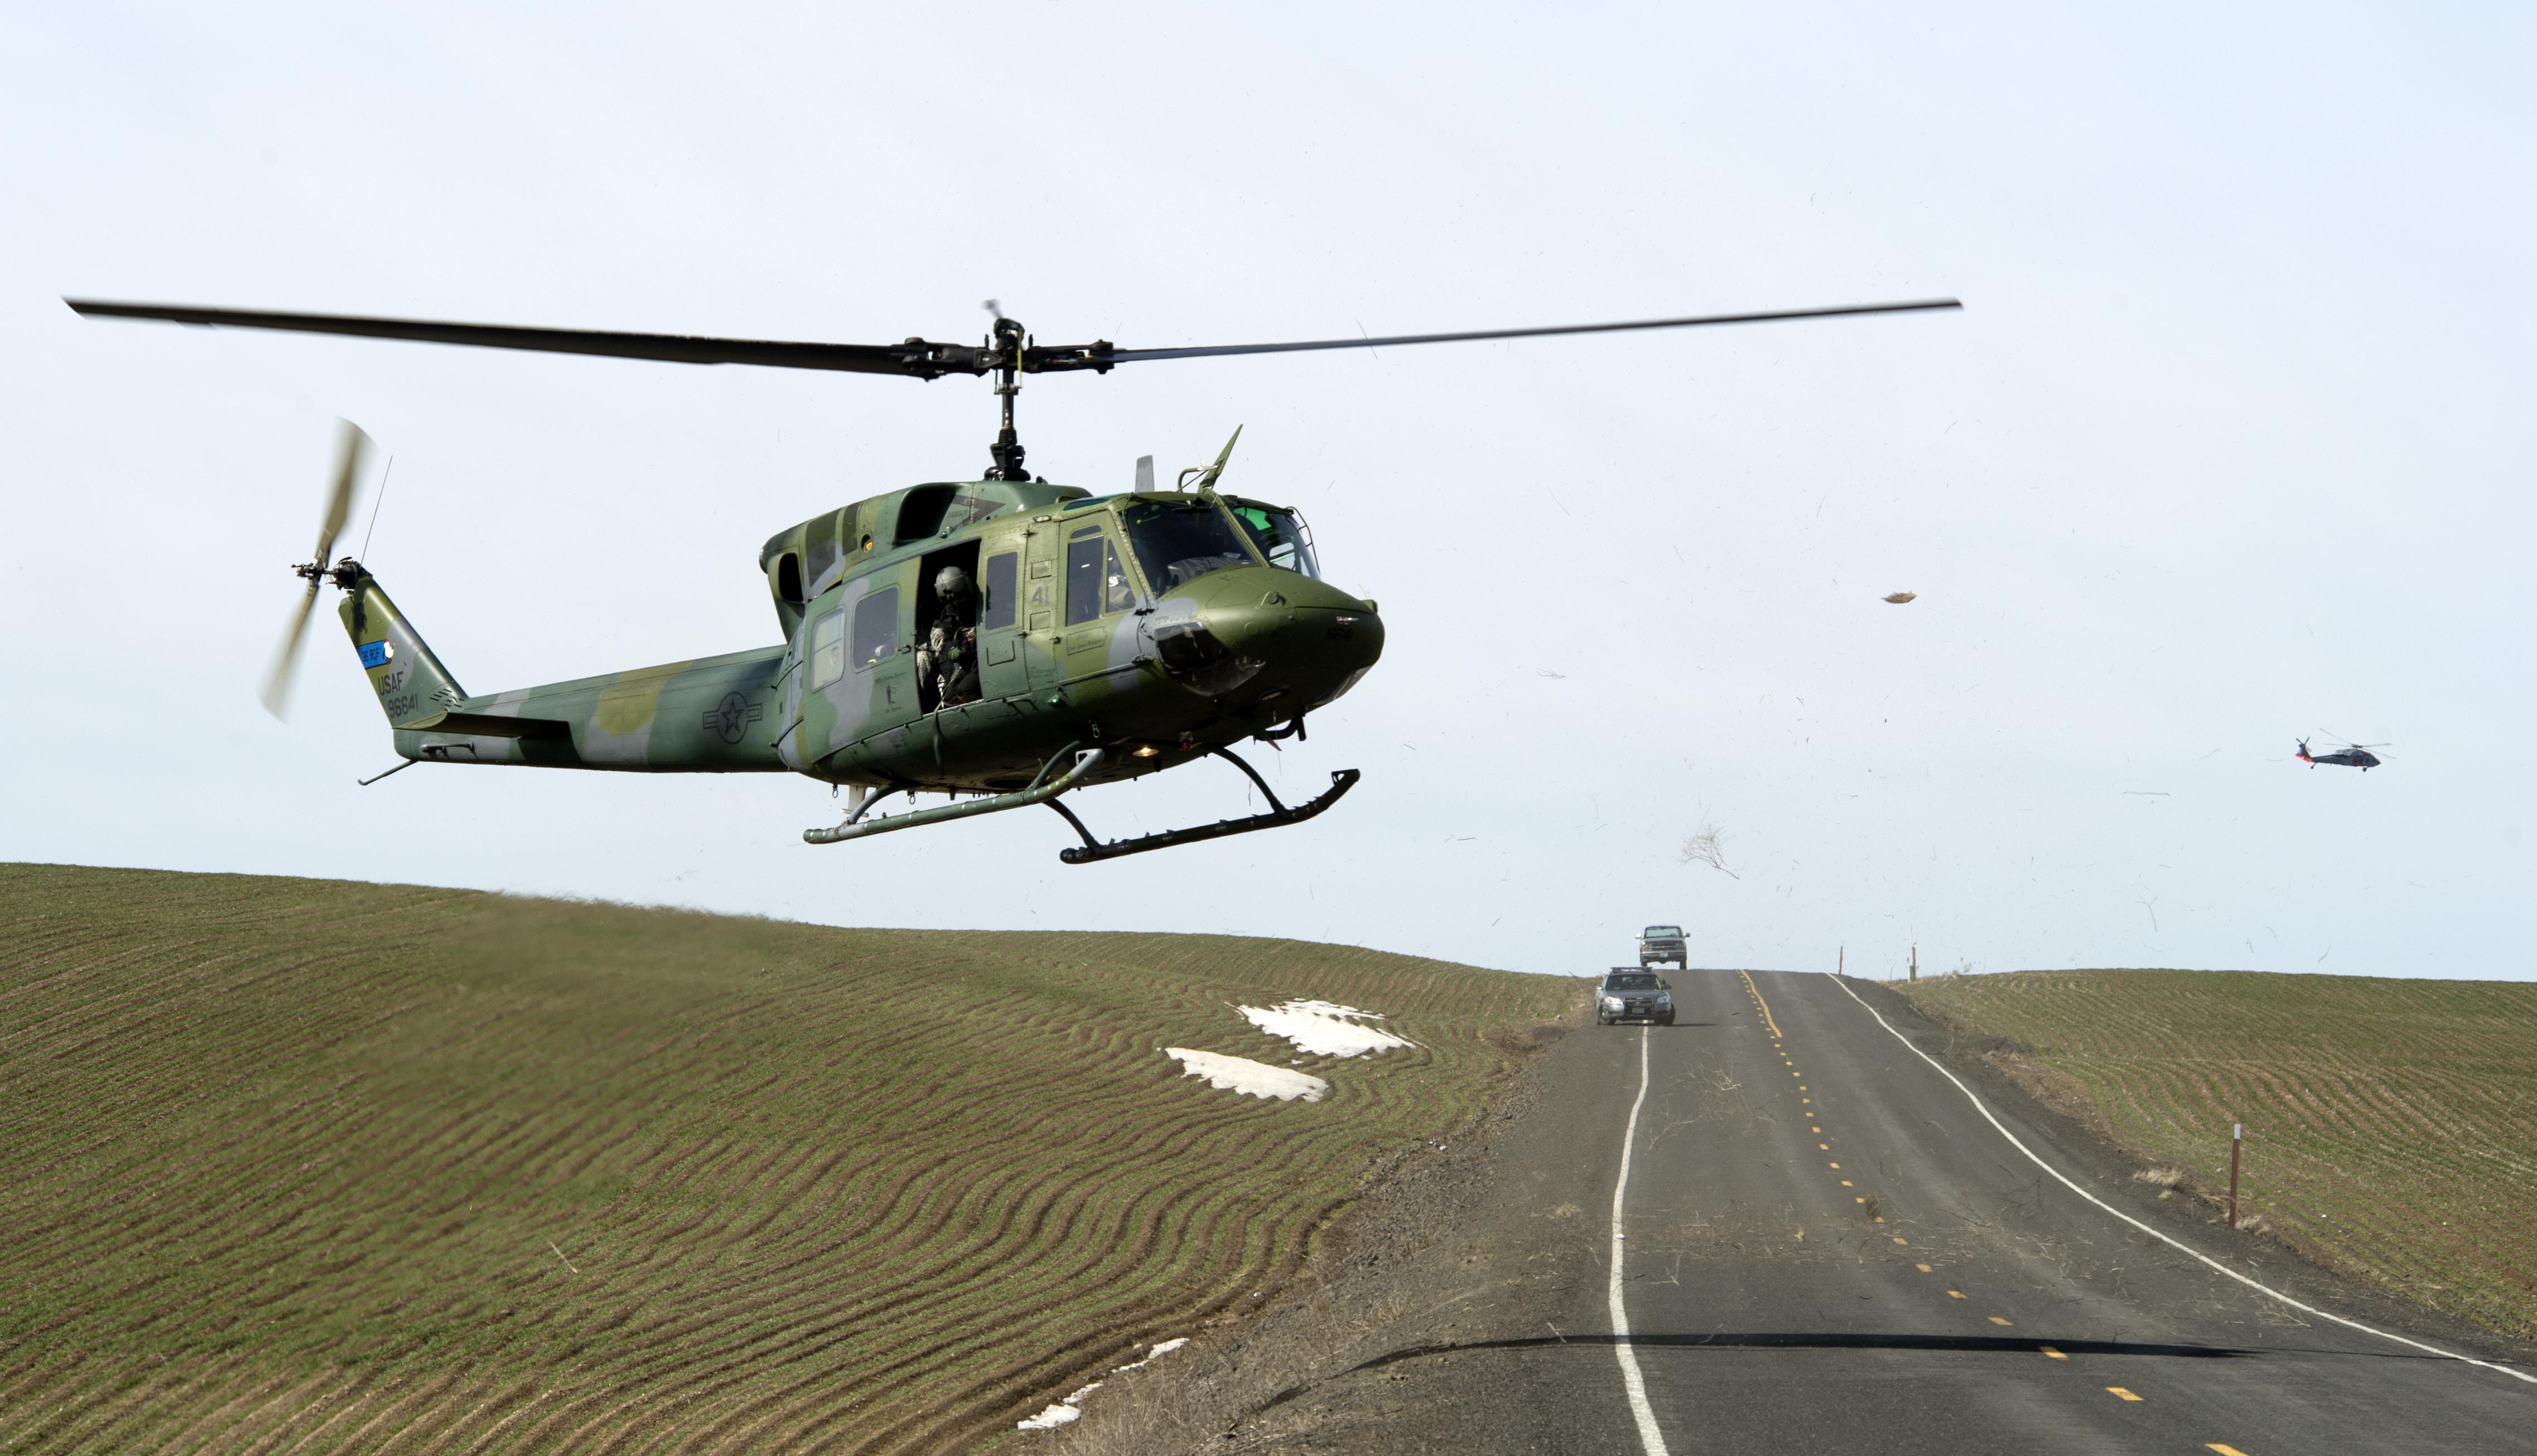 2013 Training Jet Crash Result Of Pilot Error Navy Report Says  The Spokesm